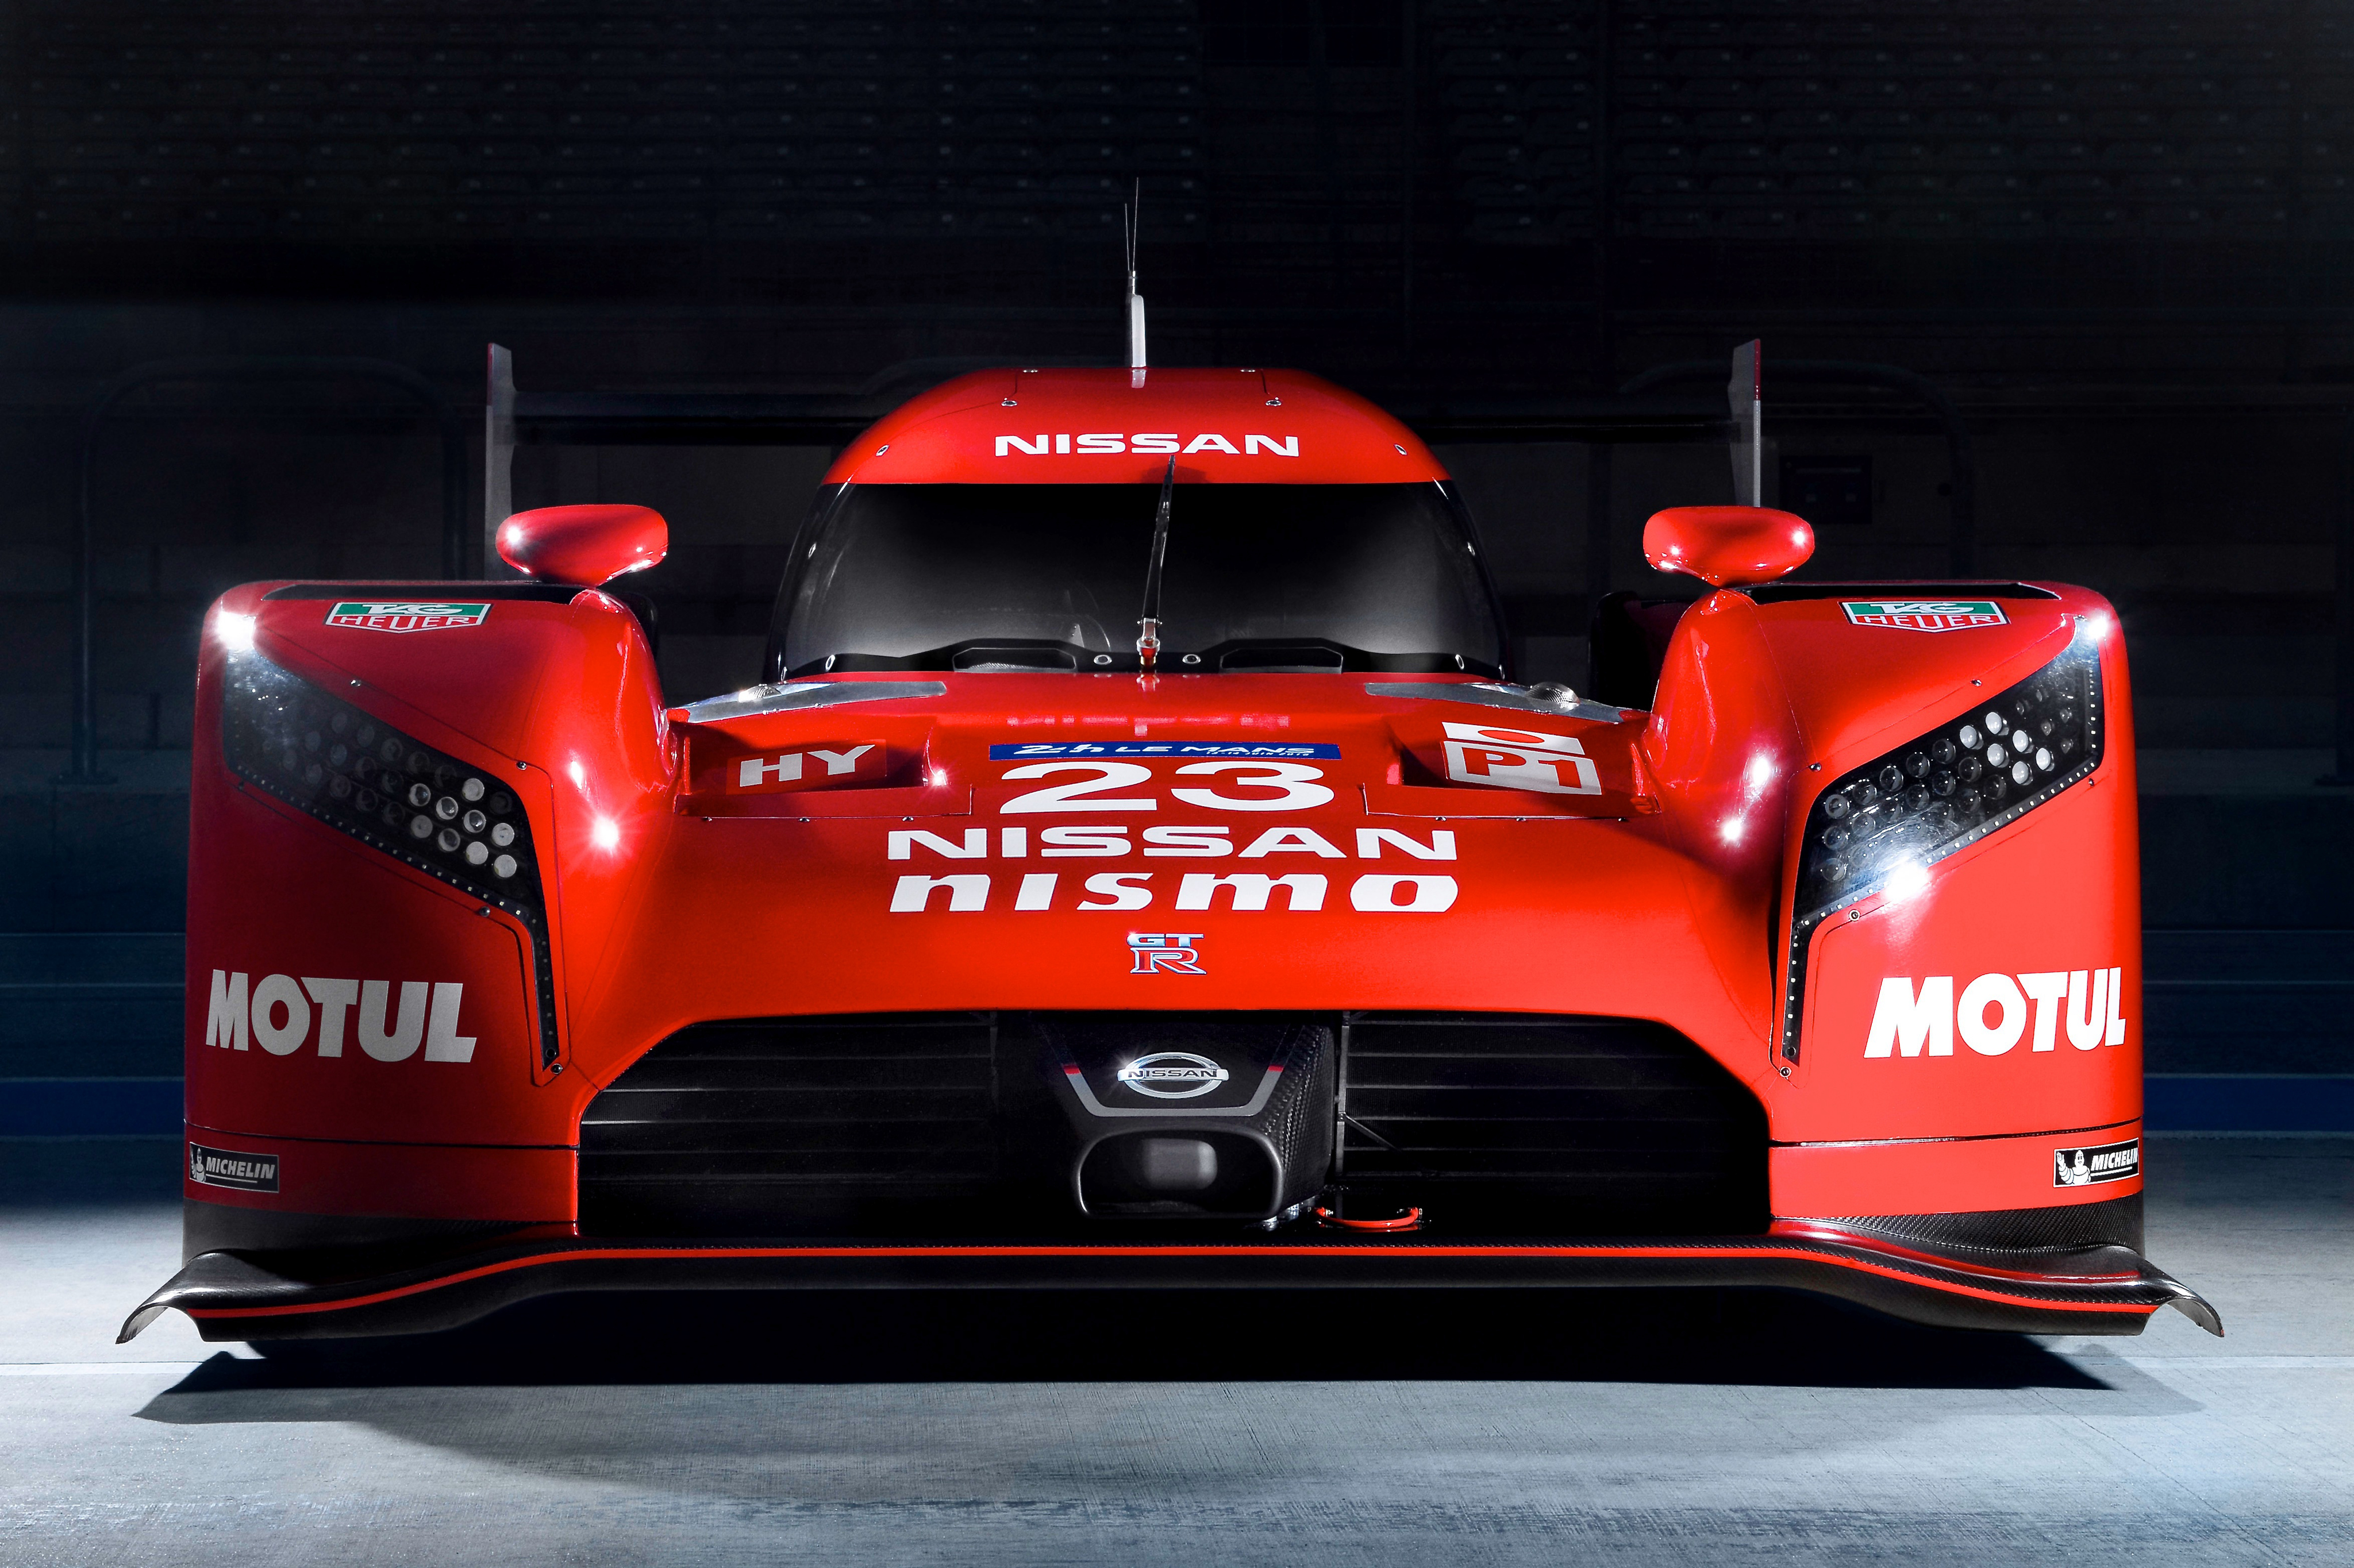 Nissan GT-R LM Nismo prototype racing car